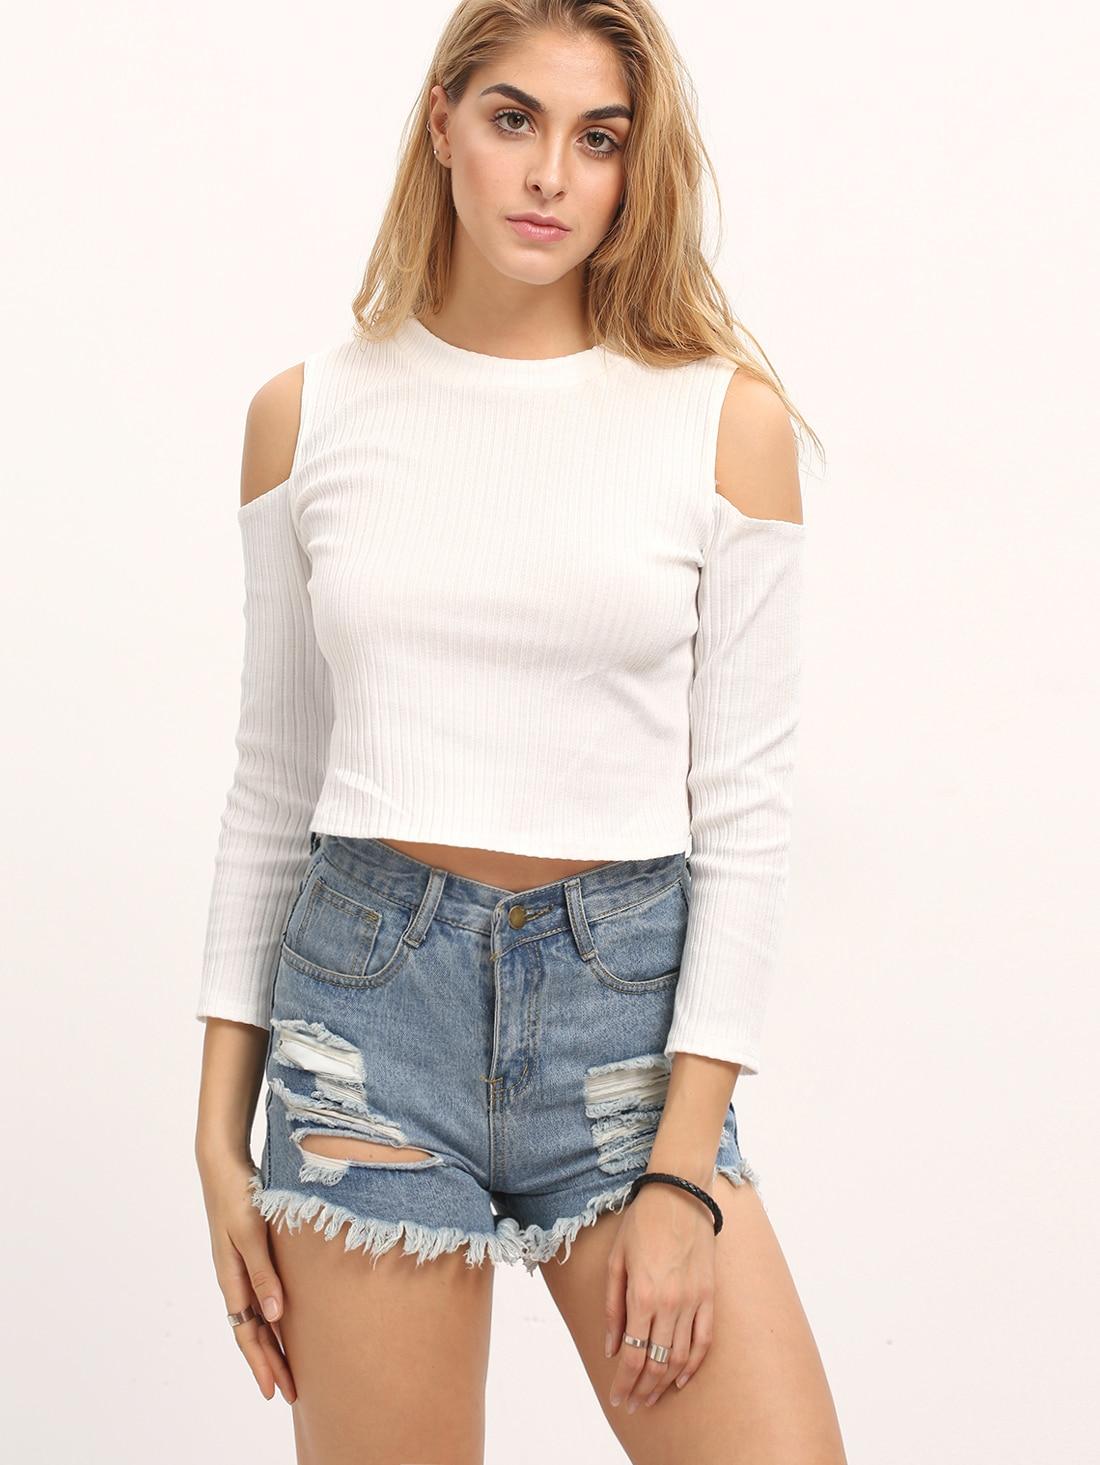 White Cold Shoulder Rib Crop Knitwear tee160308150